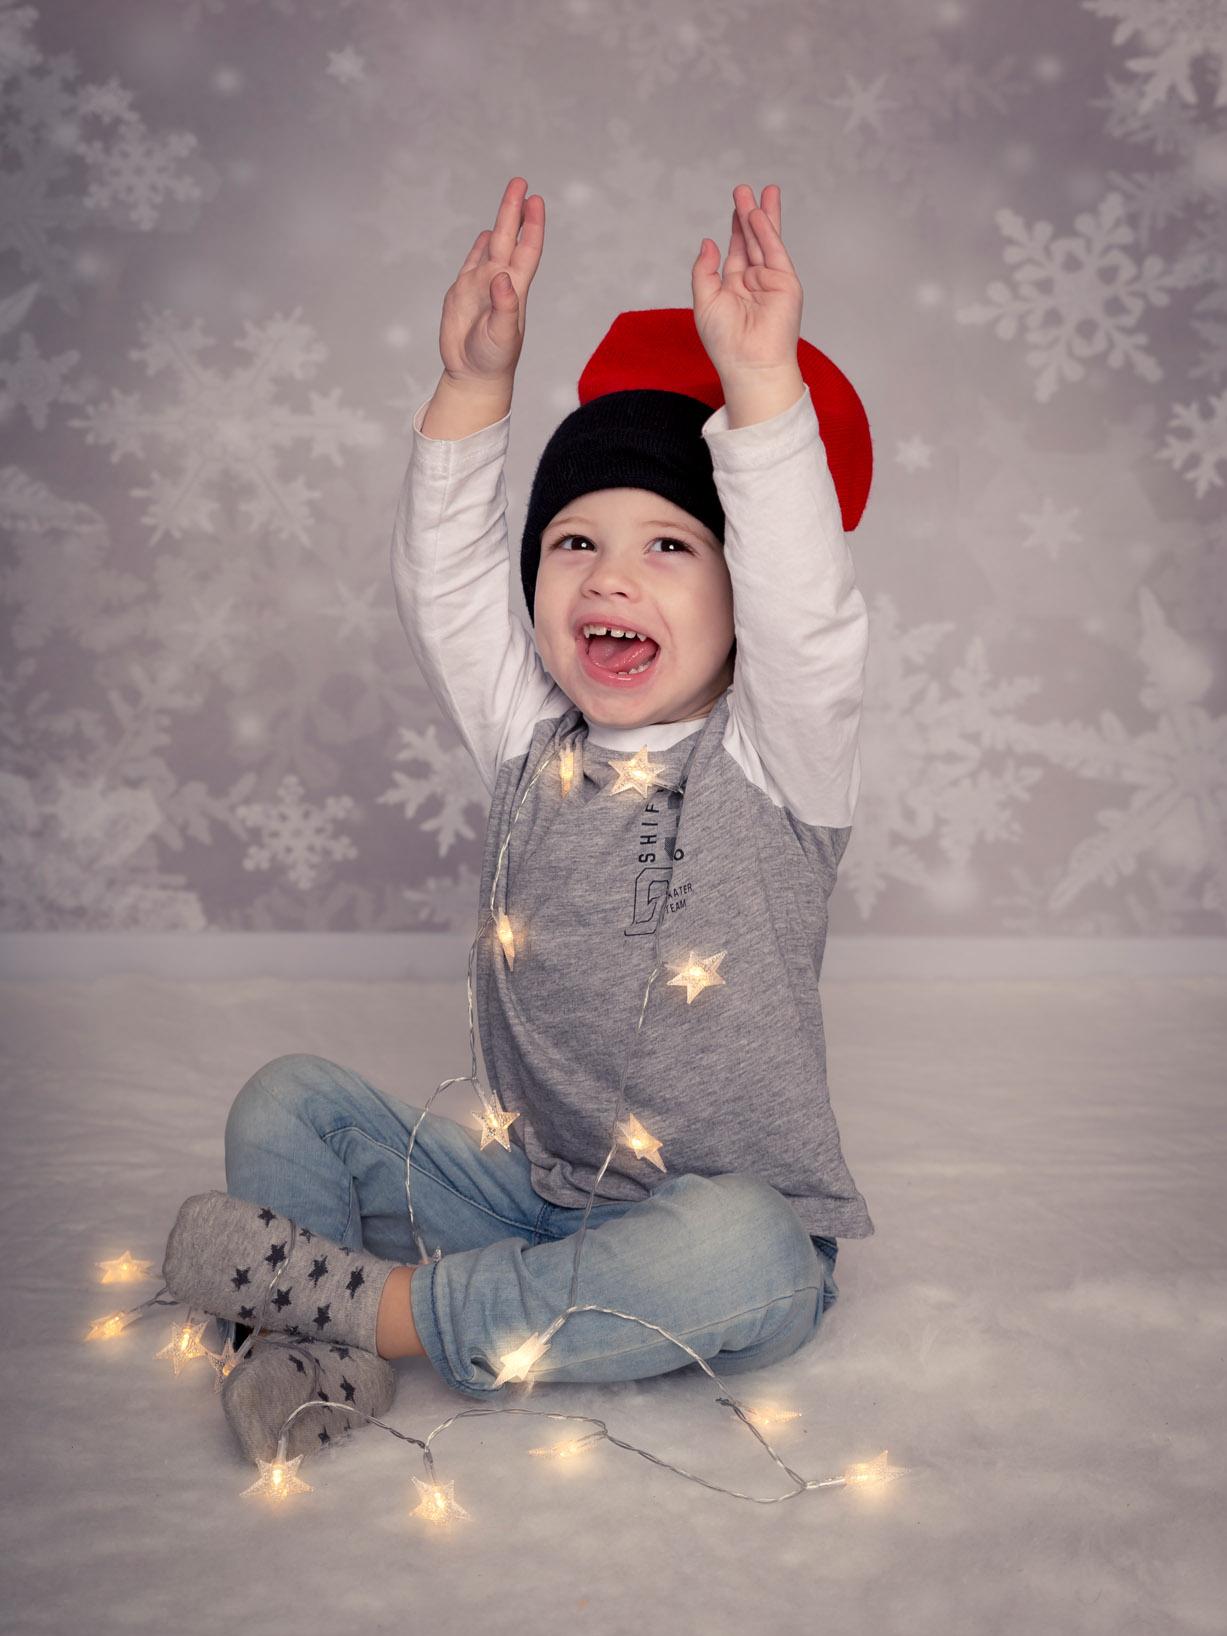 Nadal_estrelles_Albert Aumatell